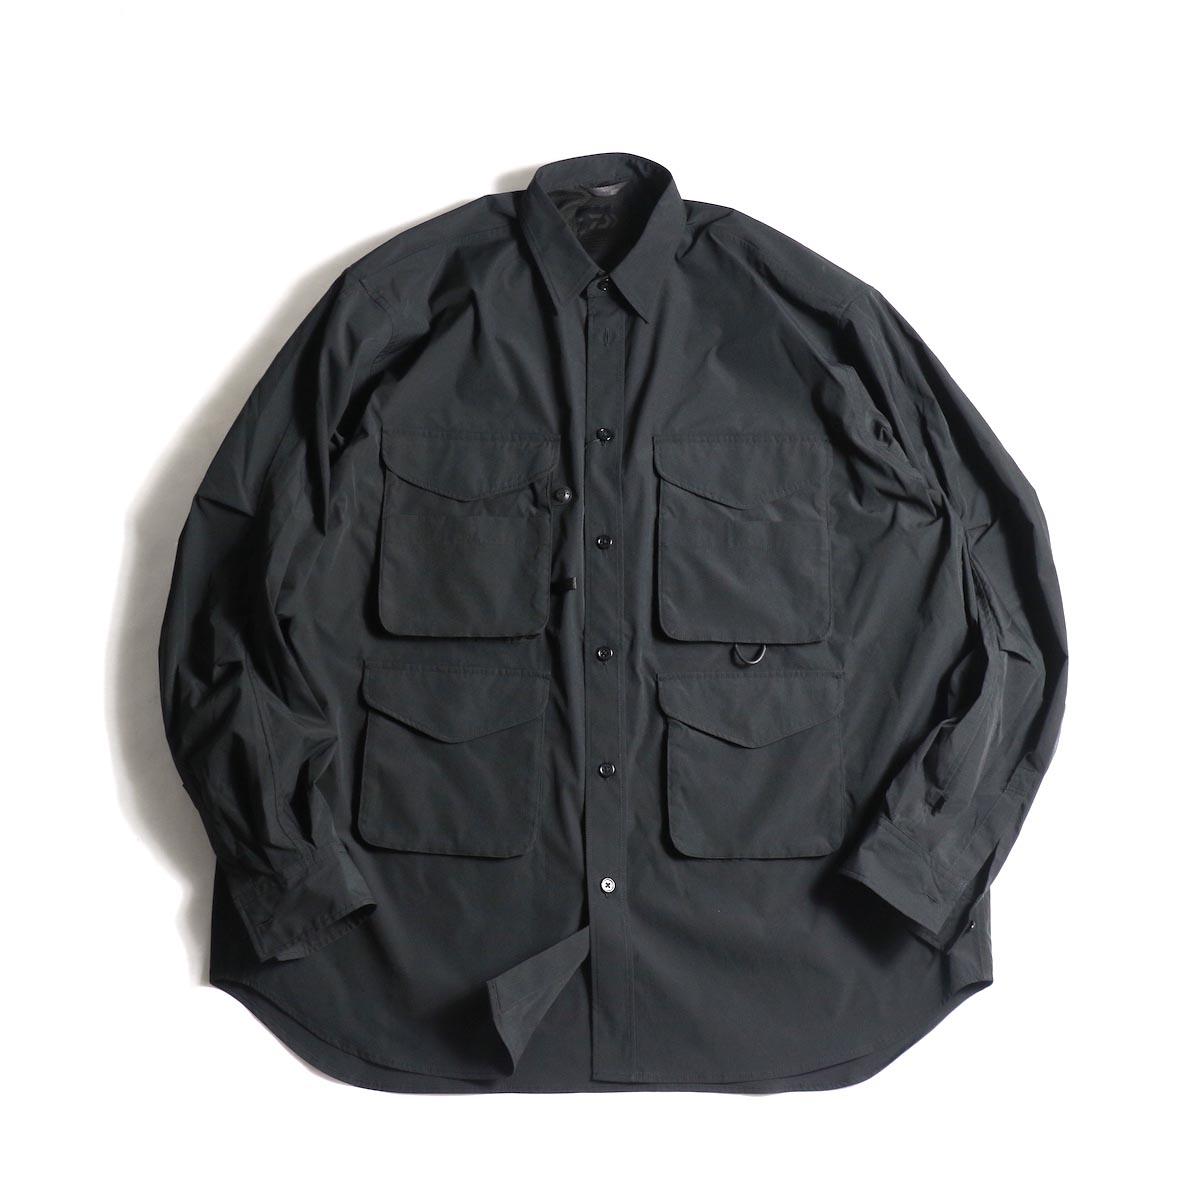 DAIWA PIER39 / MULCH POCKET FIELD SHIRTS (Black)